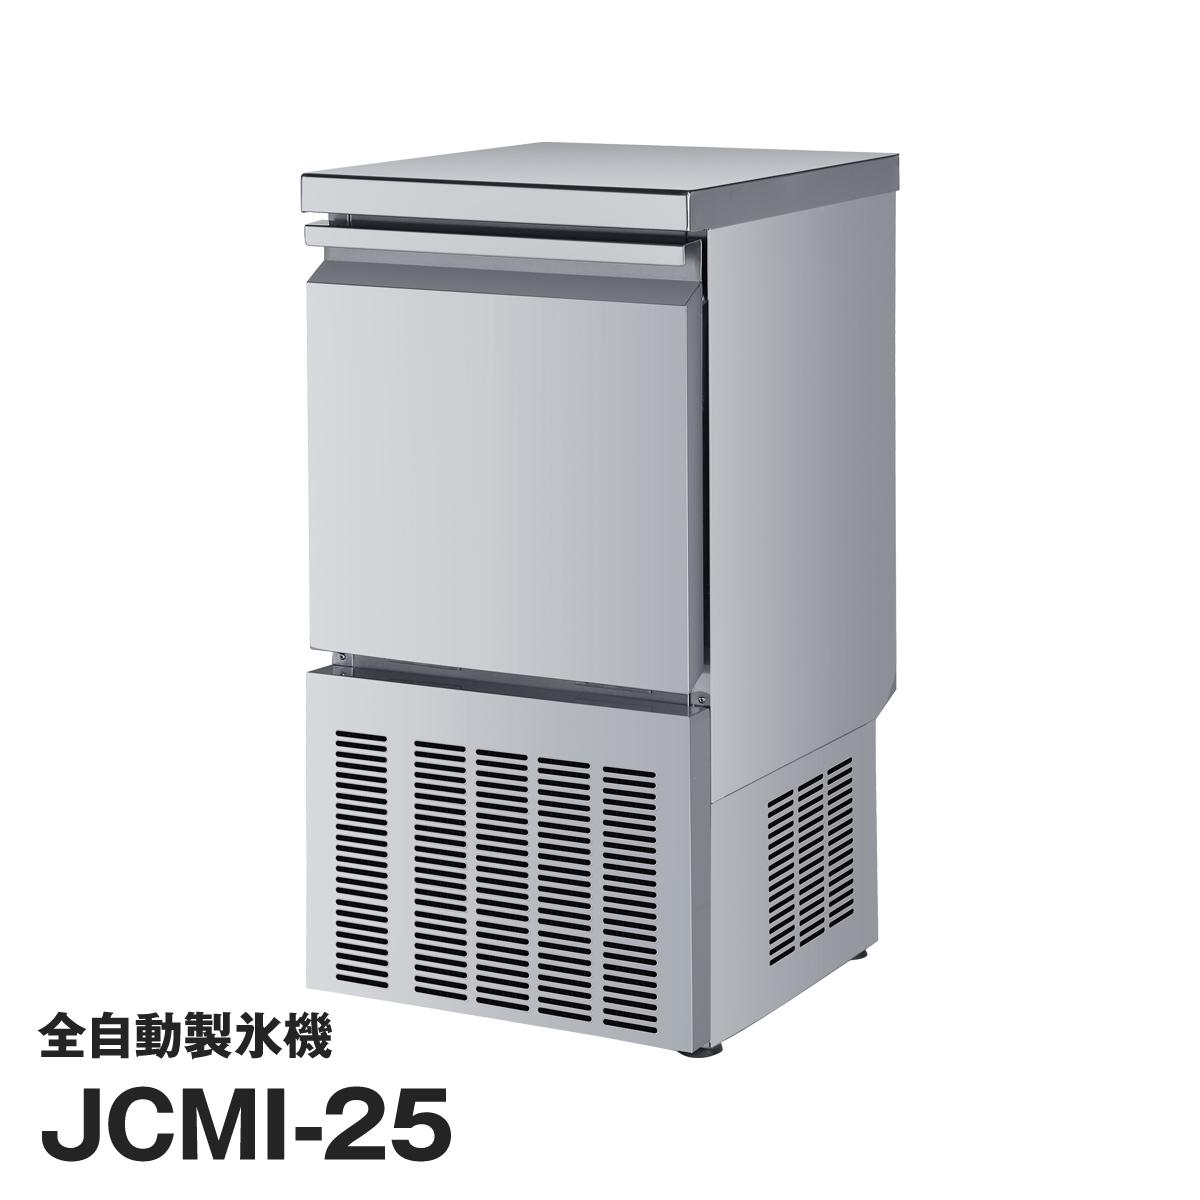 JCM社製 業務用 全自動製氷機 製氷能力 25kg JCMI-25 新品